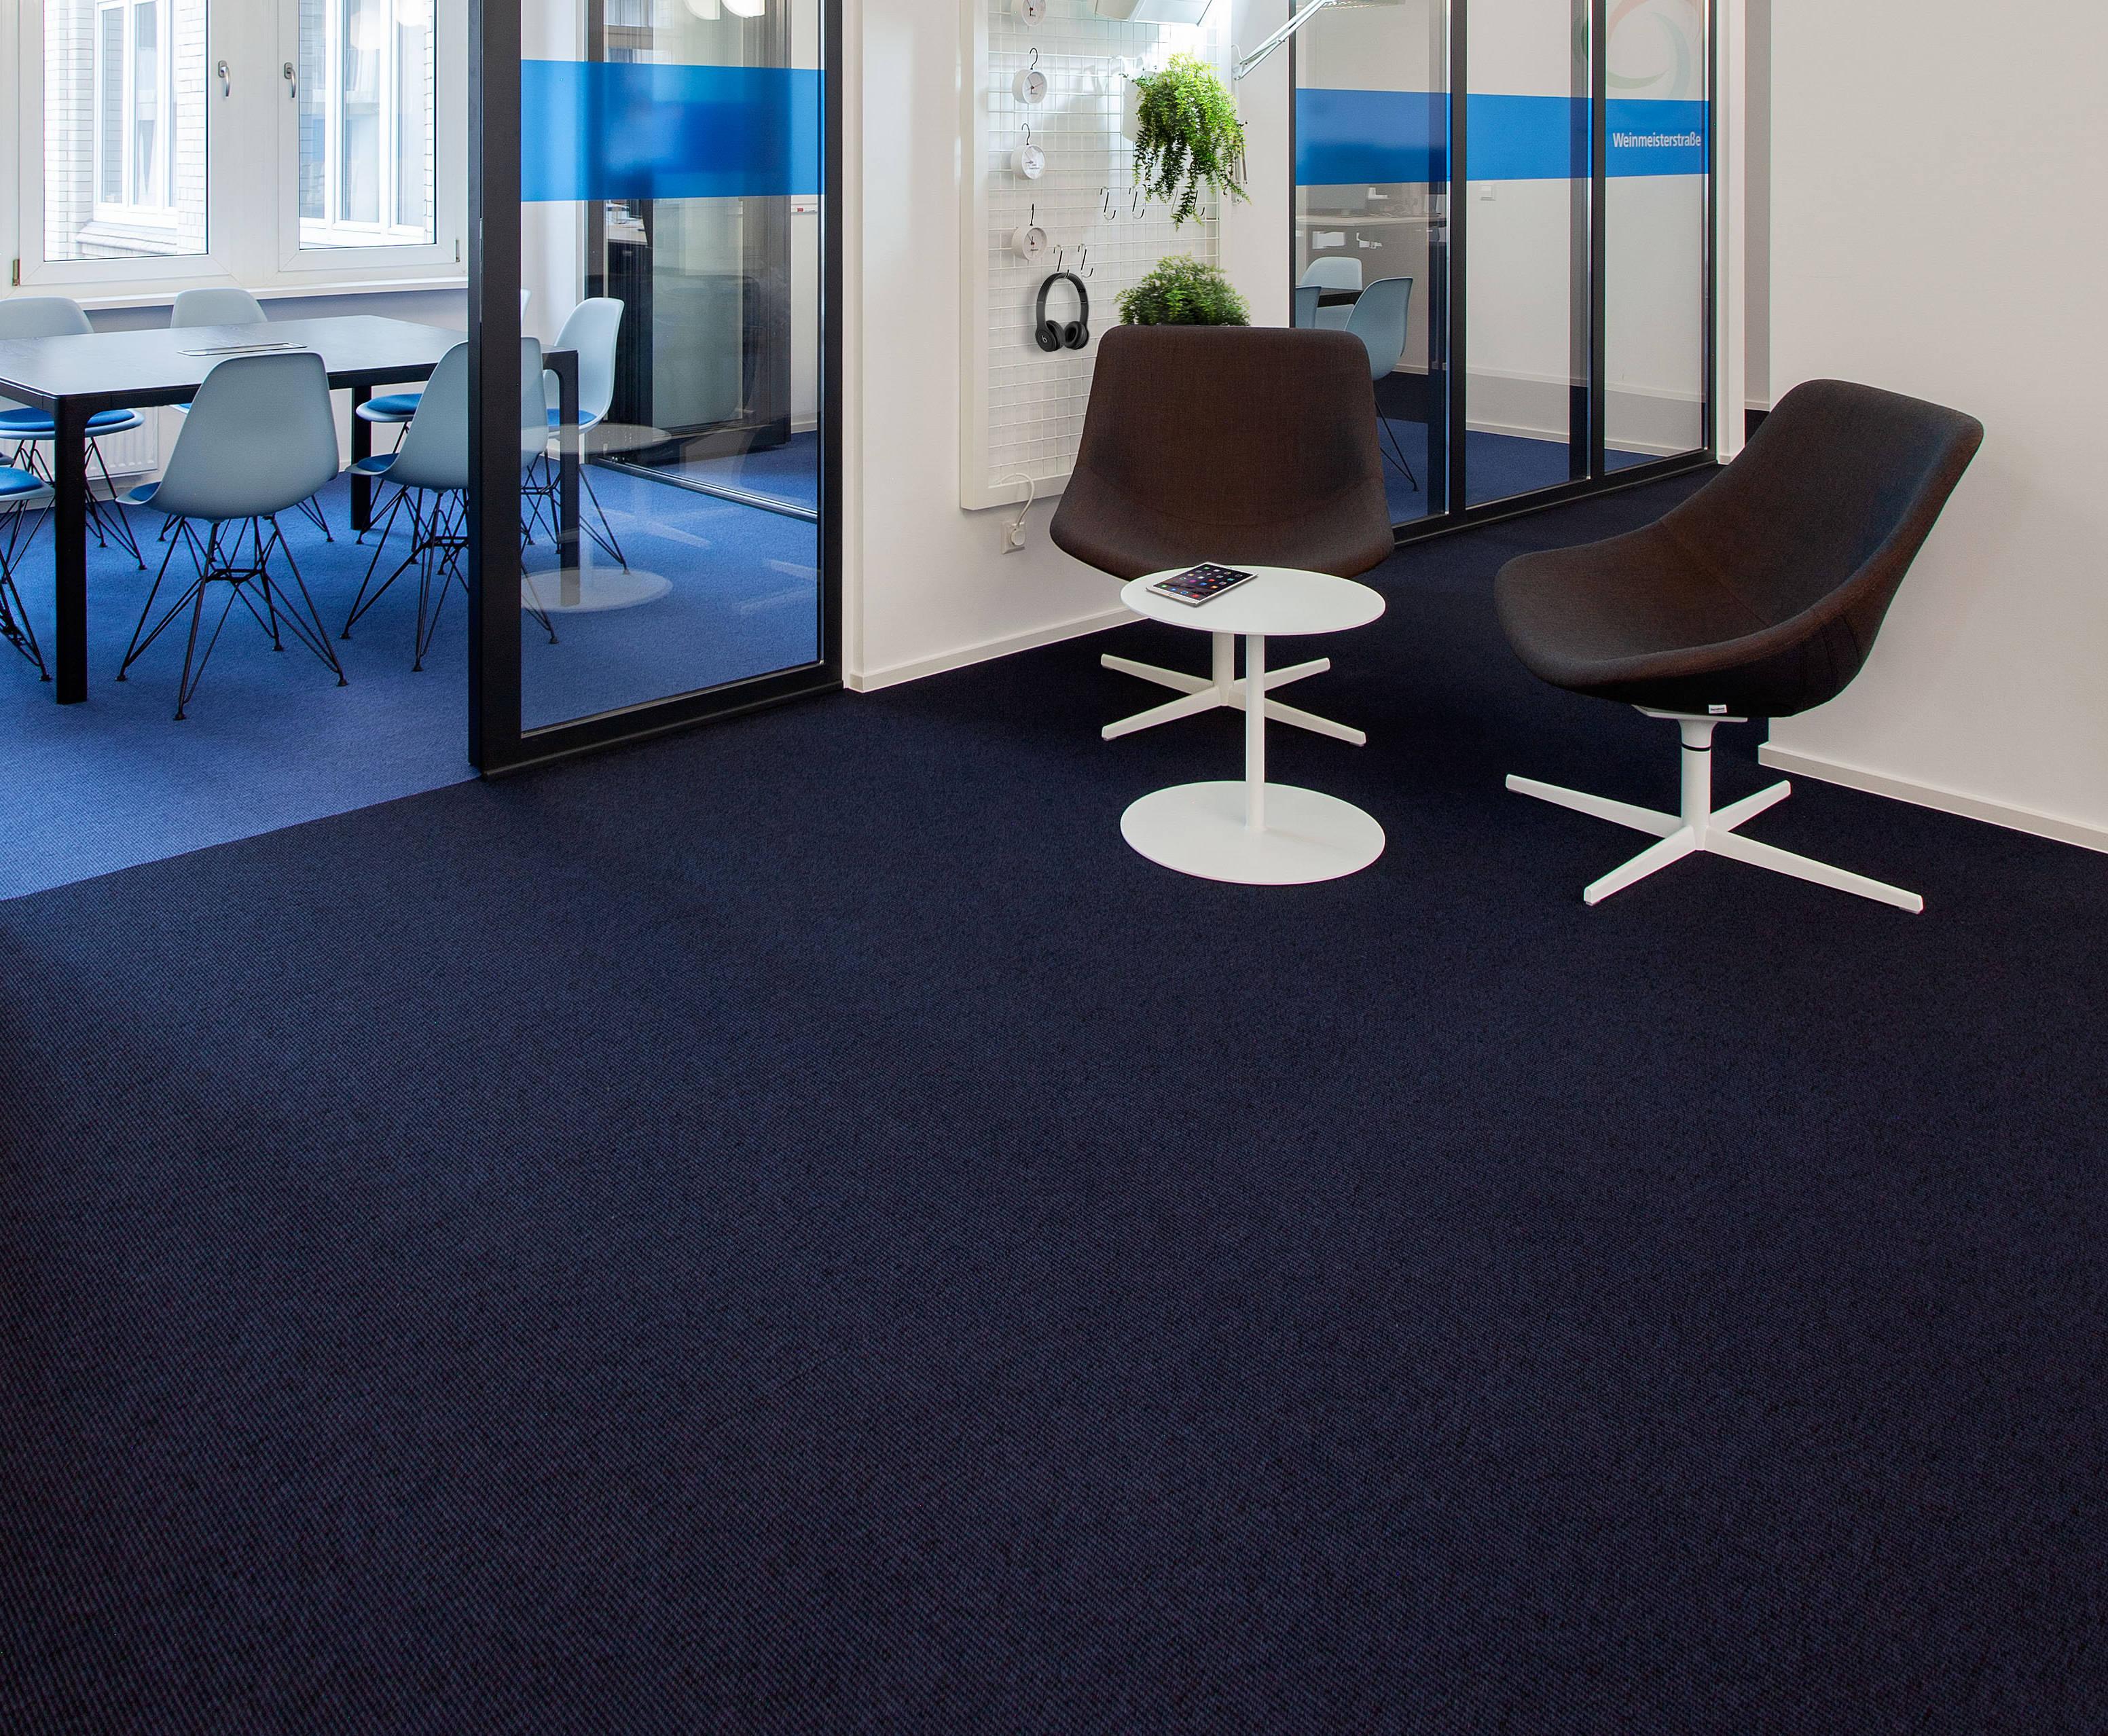 IONDESIGN GmbH